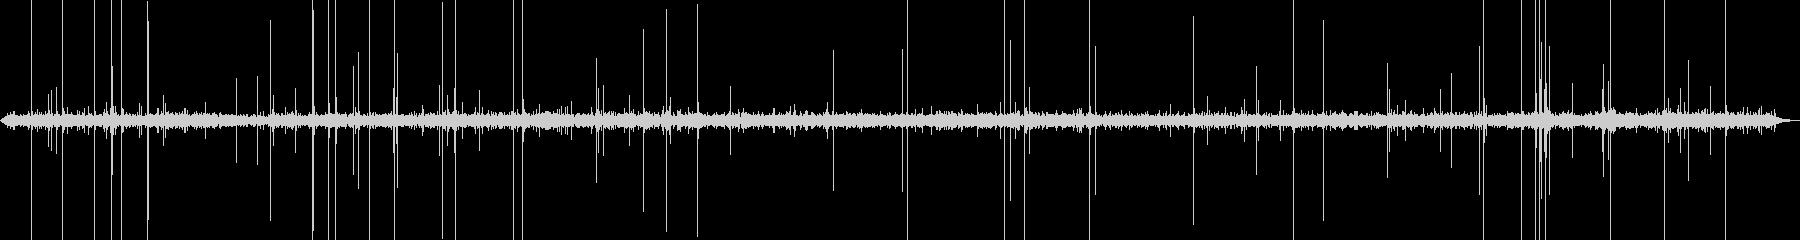 burningストーブ(中程度のパ...の未再生の波形